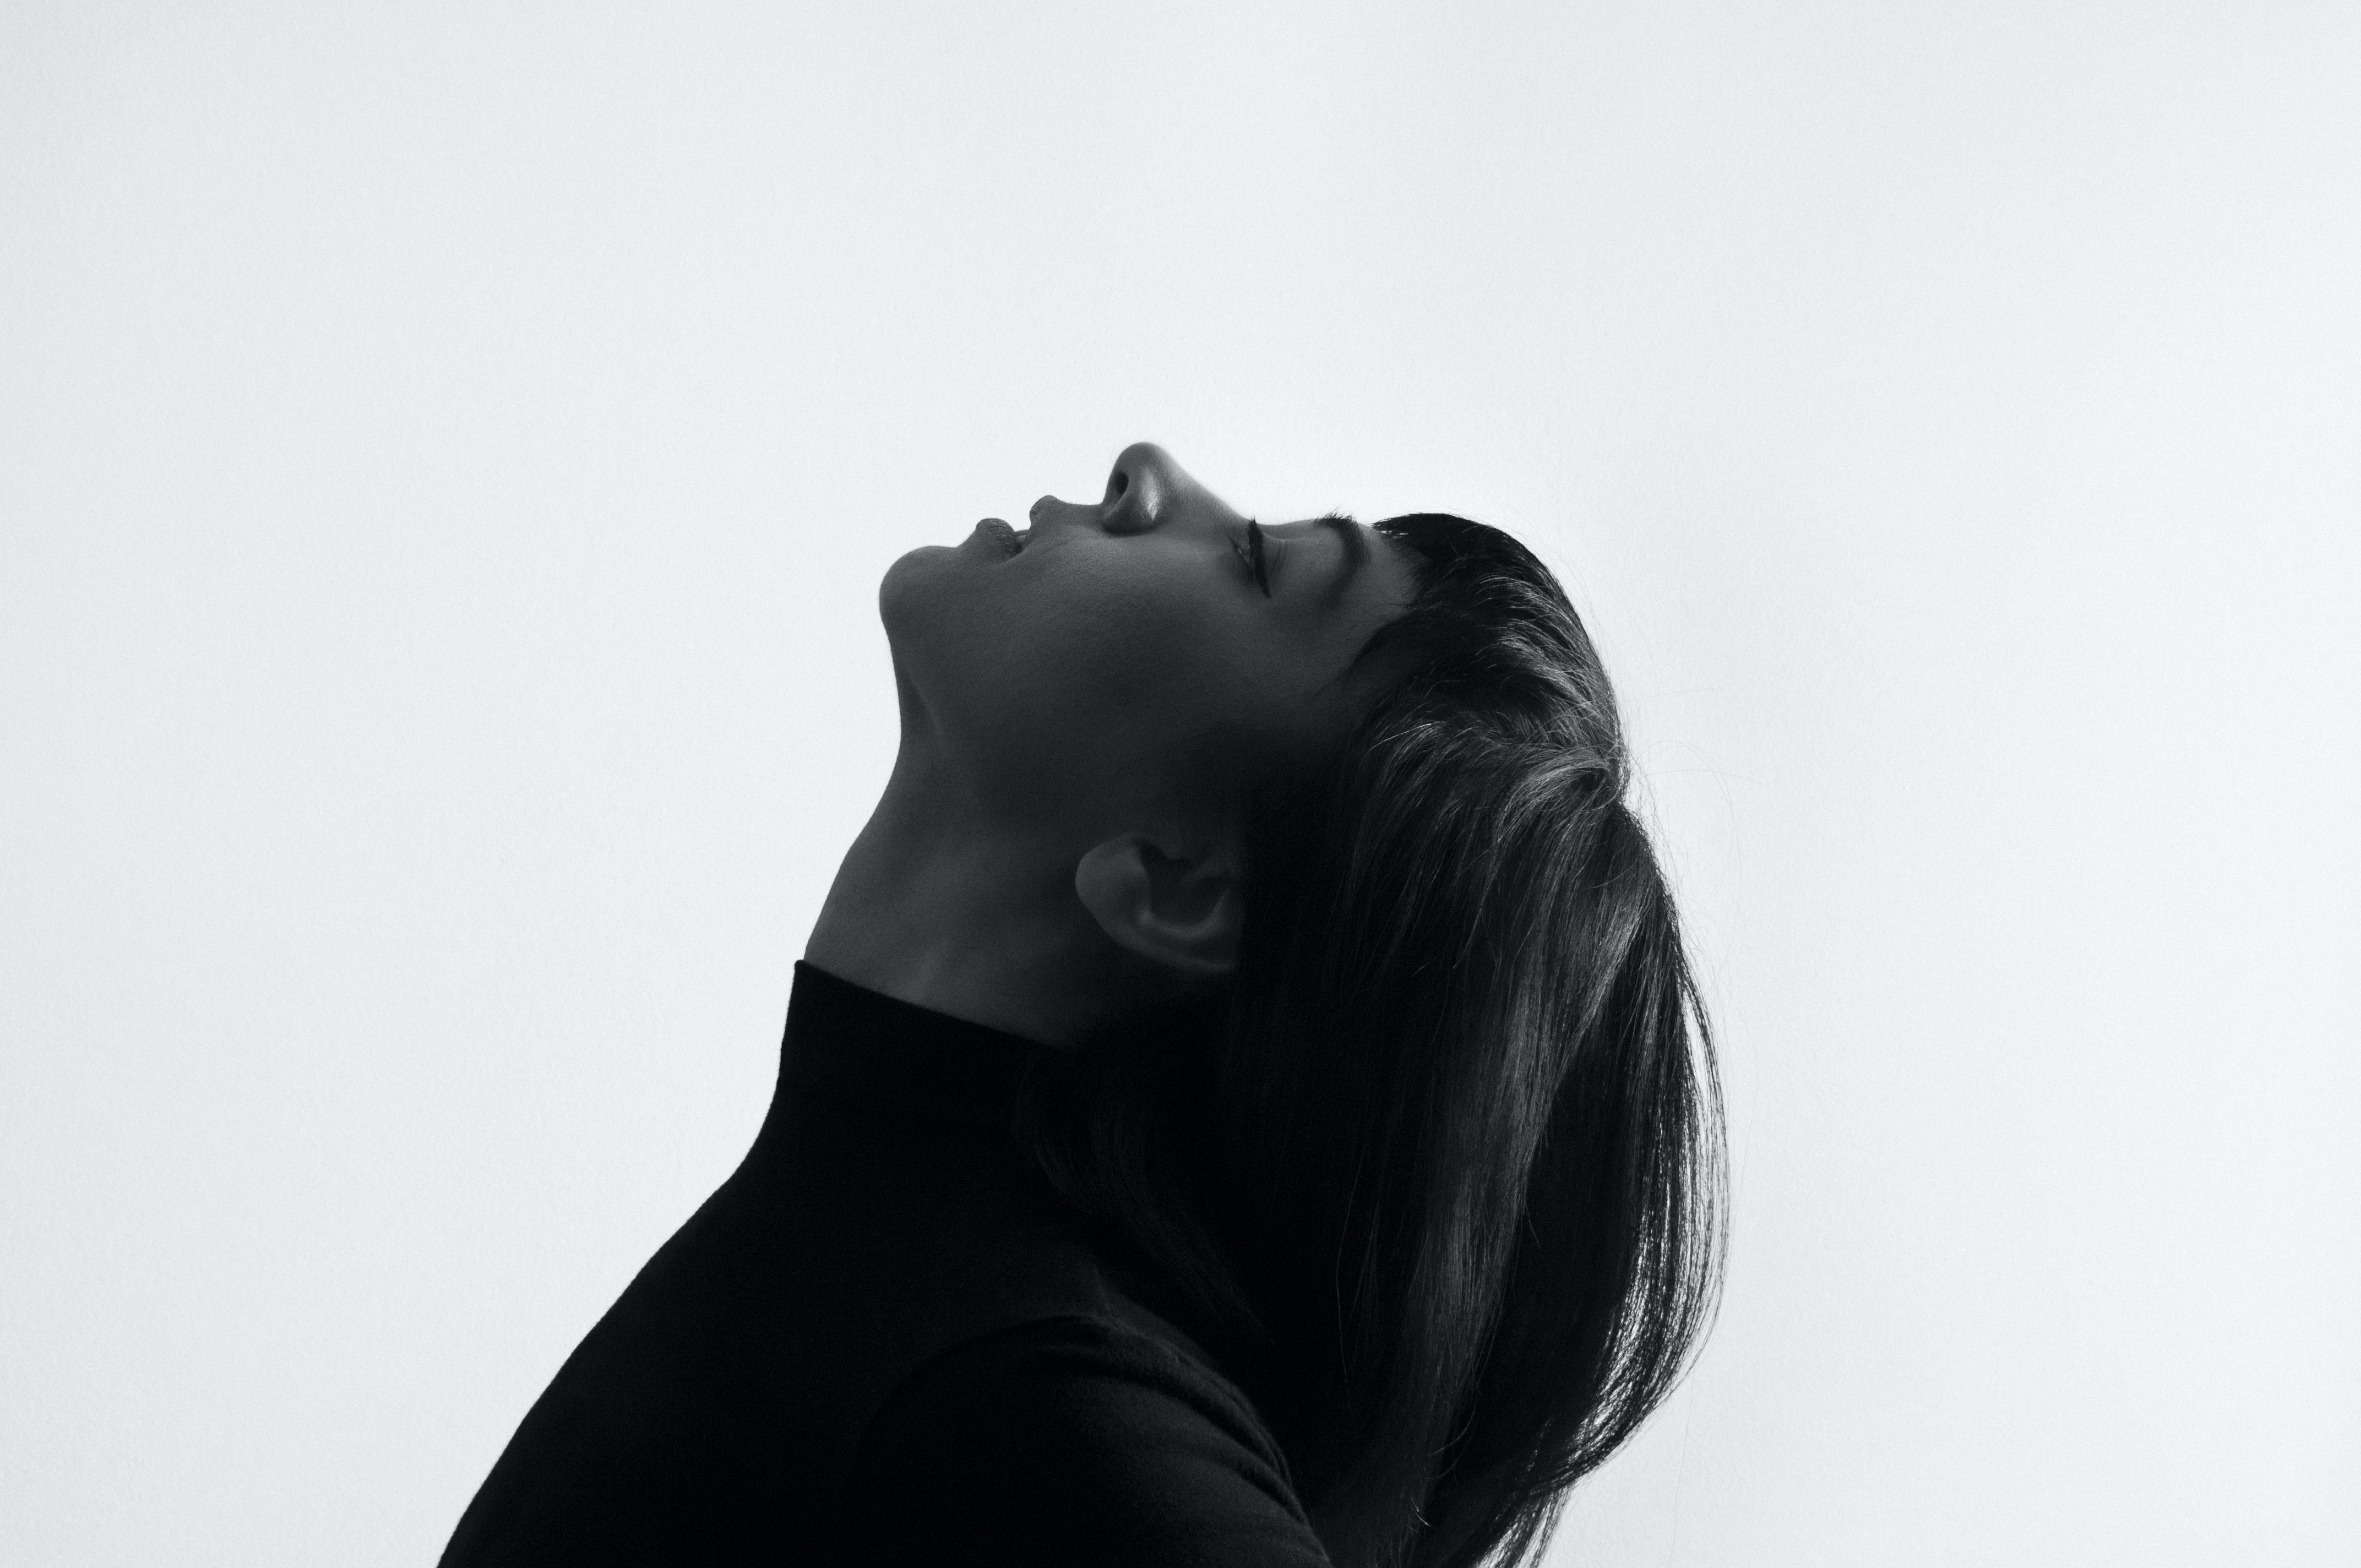 Female Grayscale Photo Facing Upward